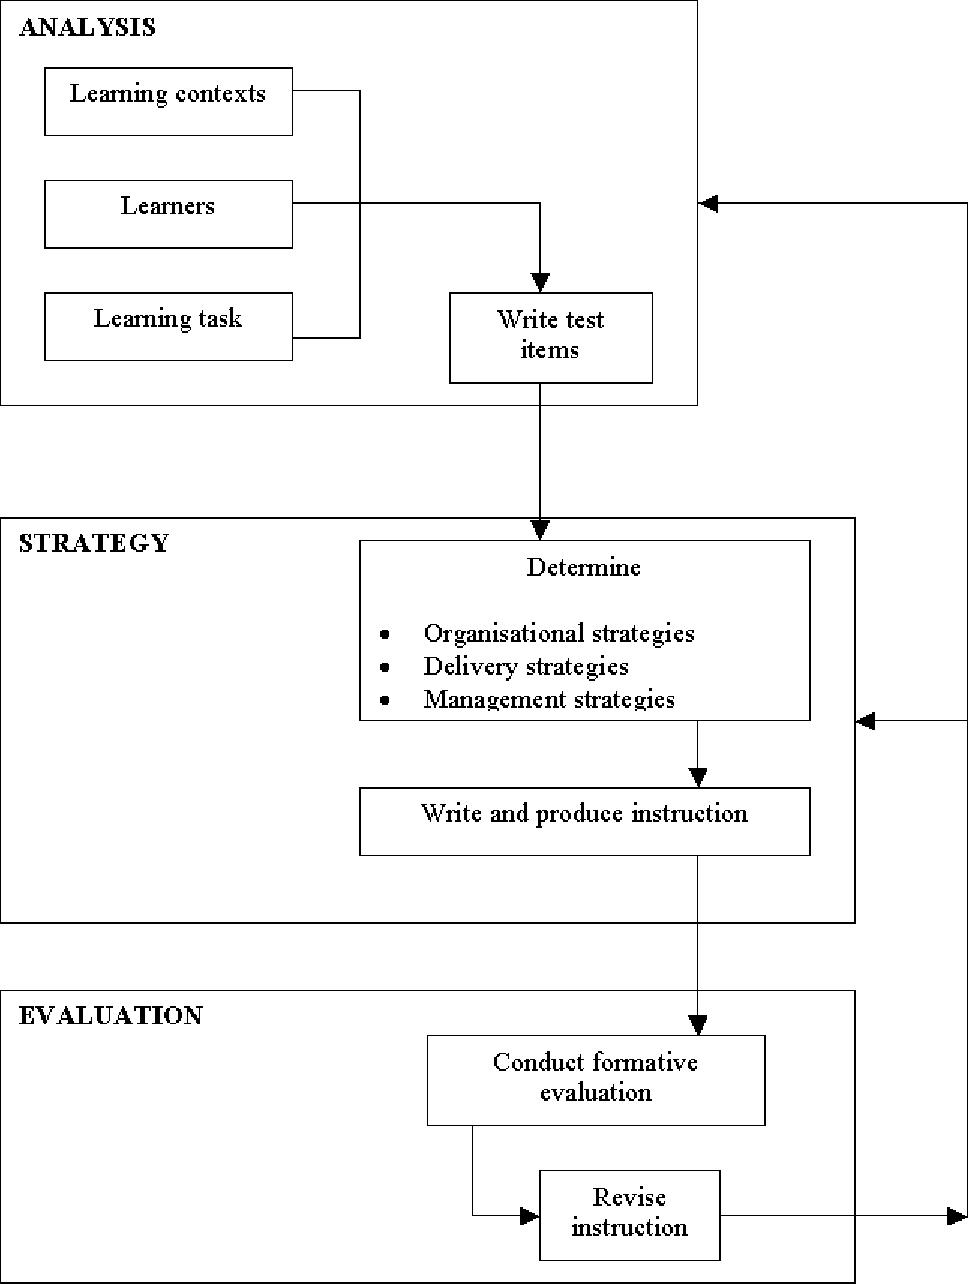 Figure 8 2 From Chapter 8 Instructional Design Semantic Scholar